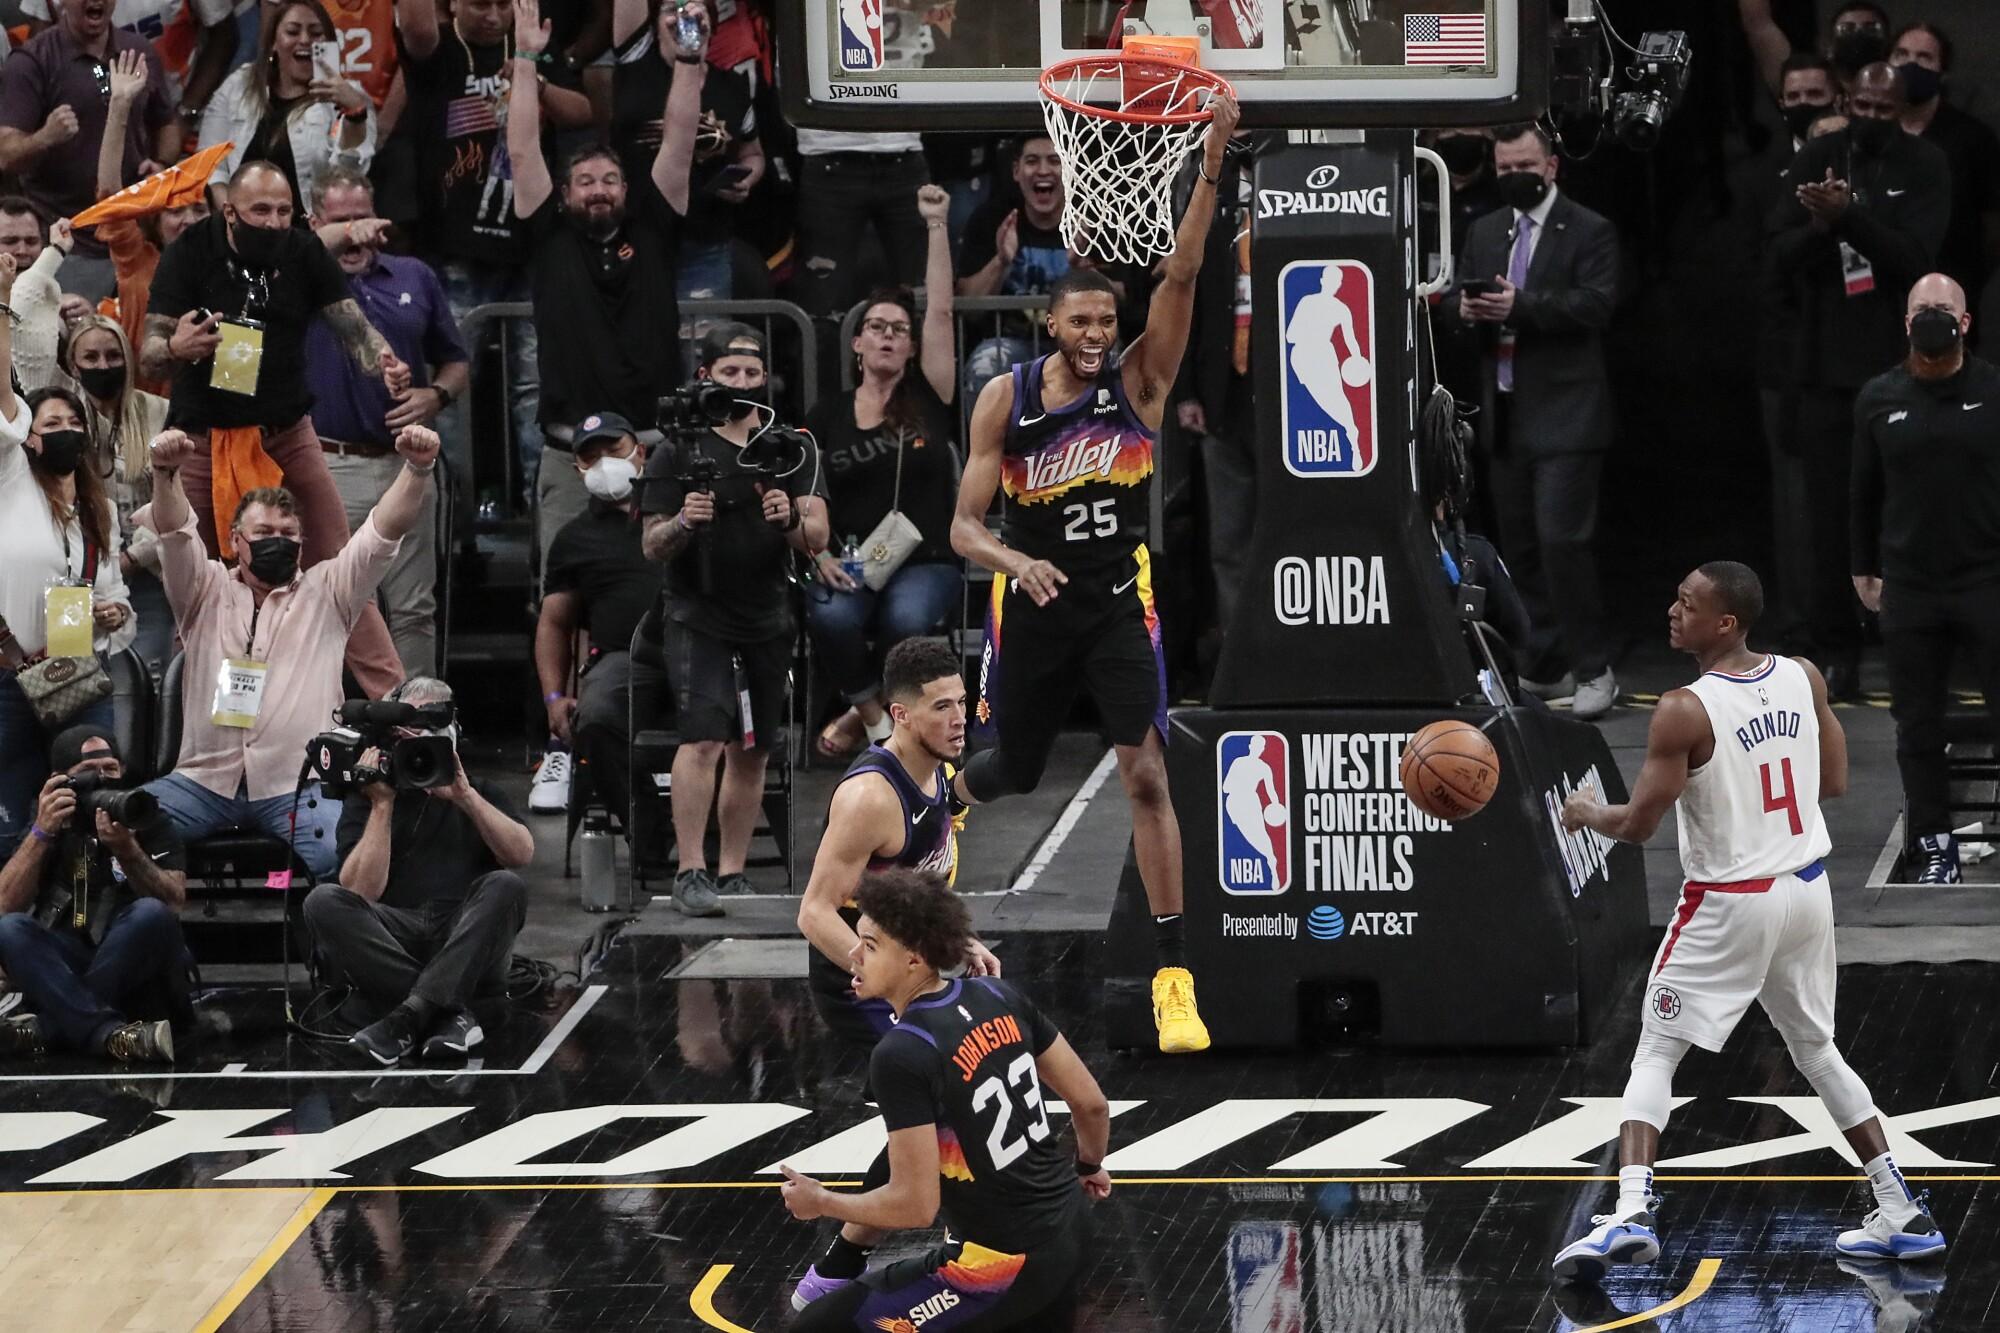 Phoenix forward Mikal Bridges celebrates while dunking over Clippers guard Rajon Rondo.